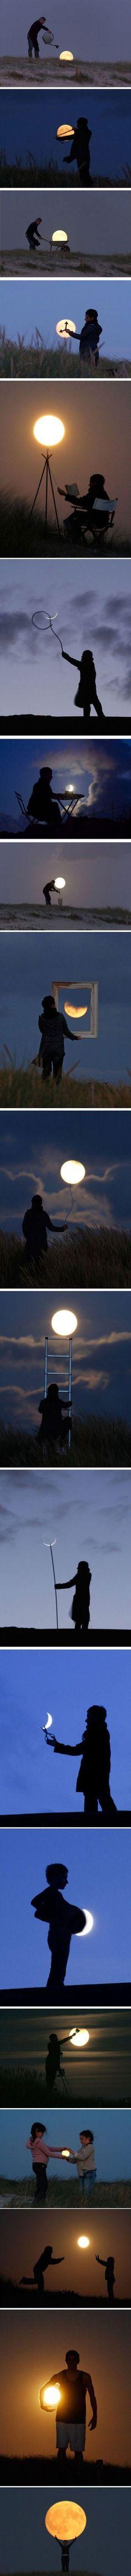 Having fun with the moon - thought of you Lisa @Lisa Pangburn-Fenton